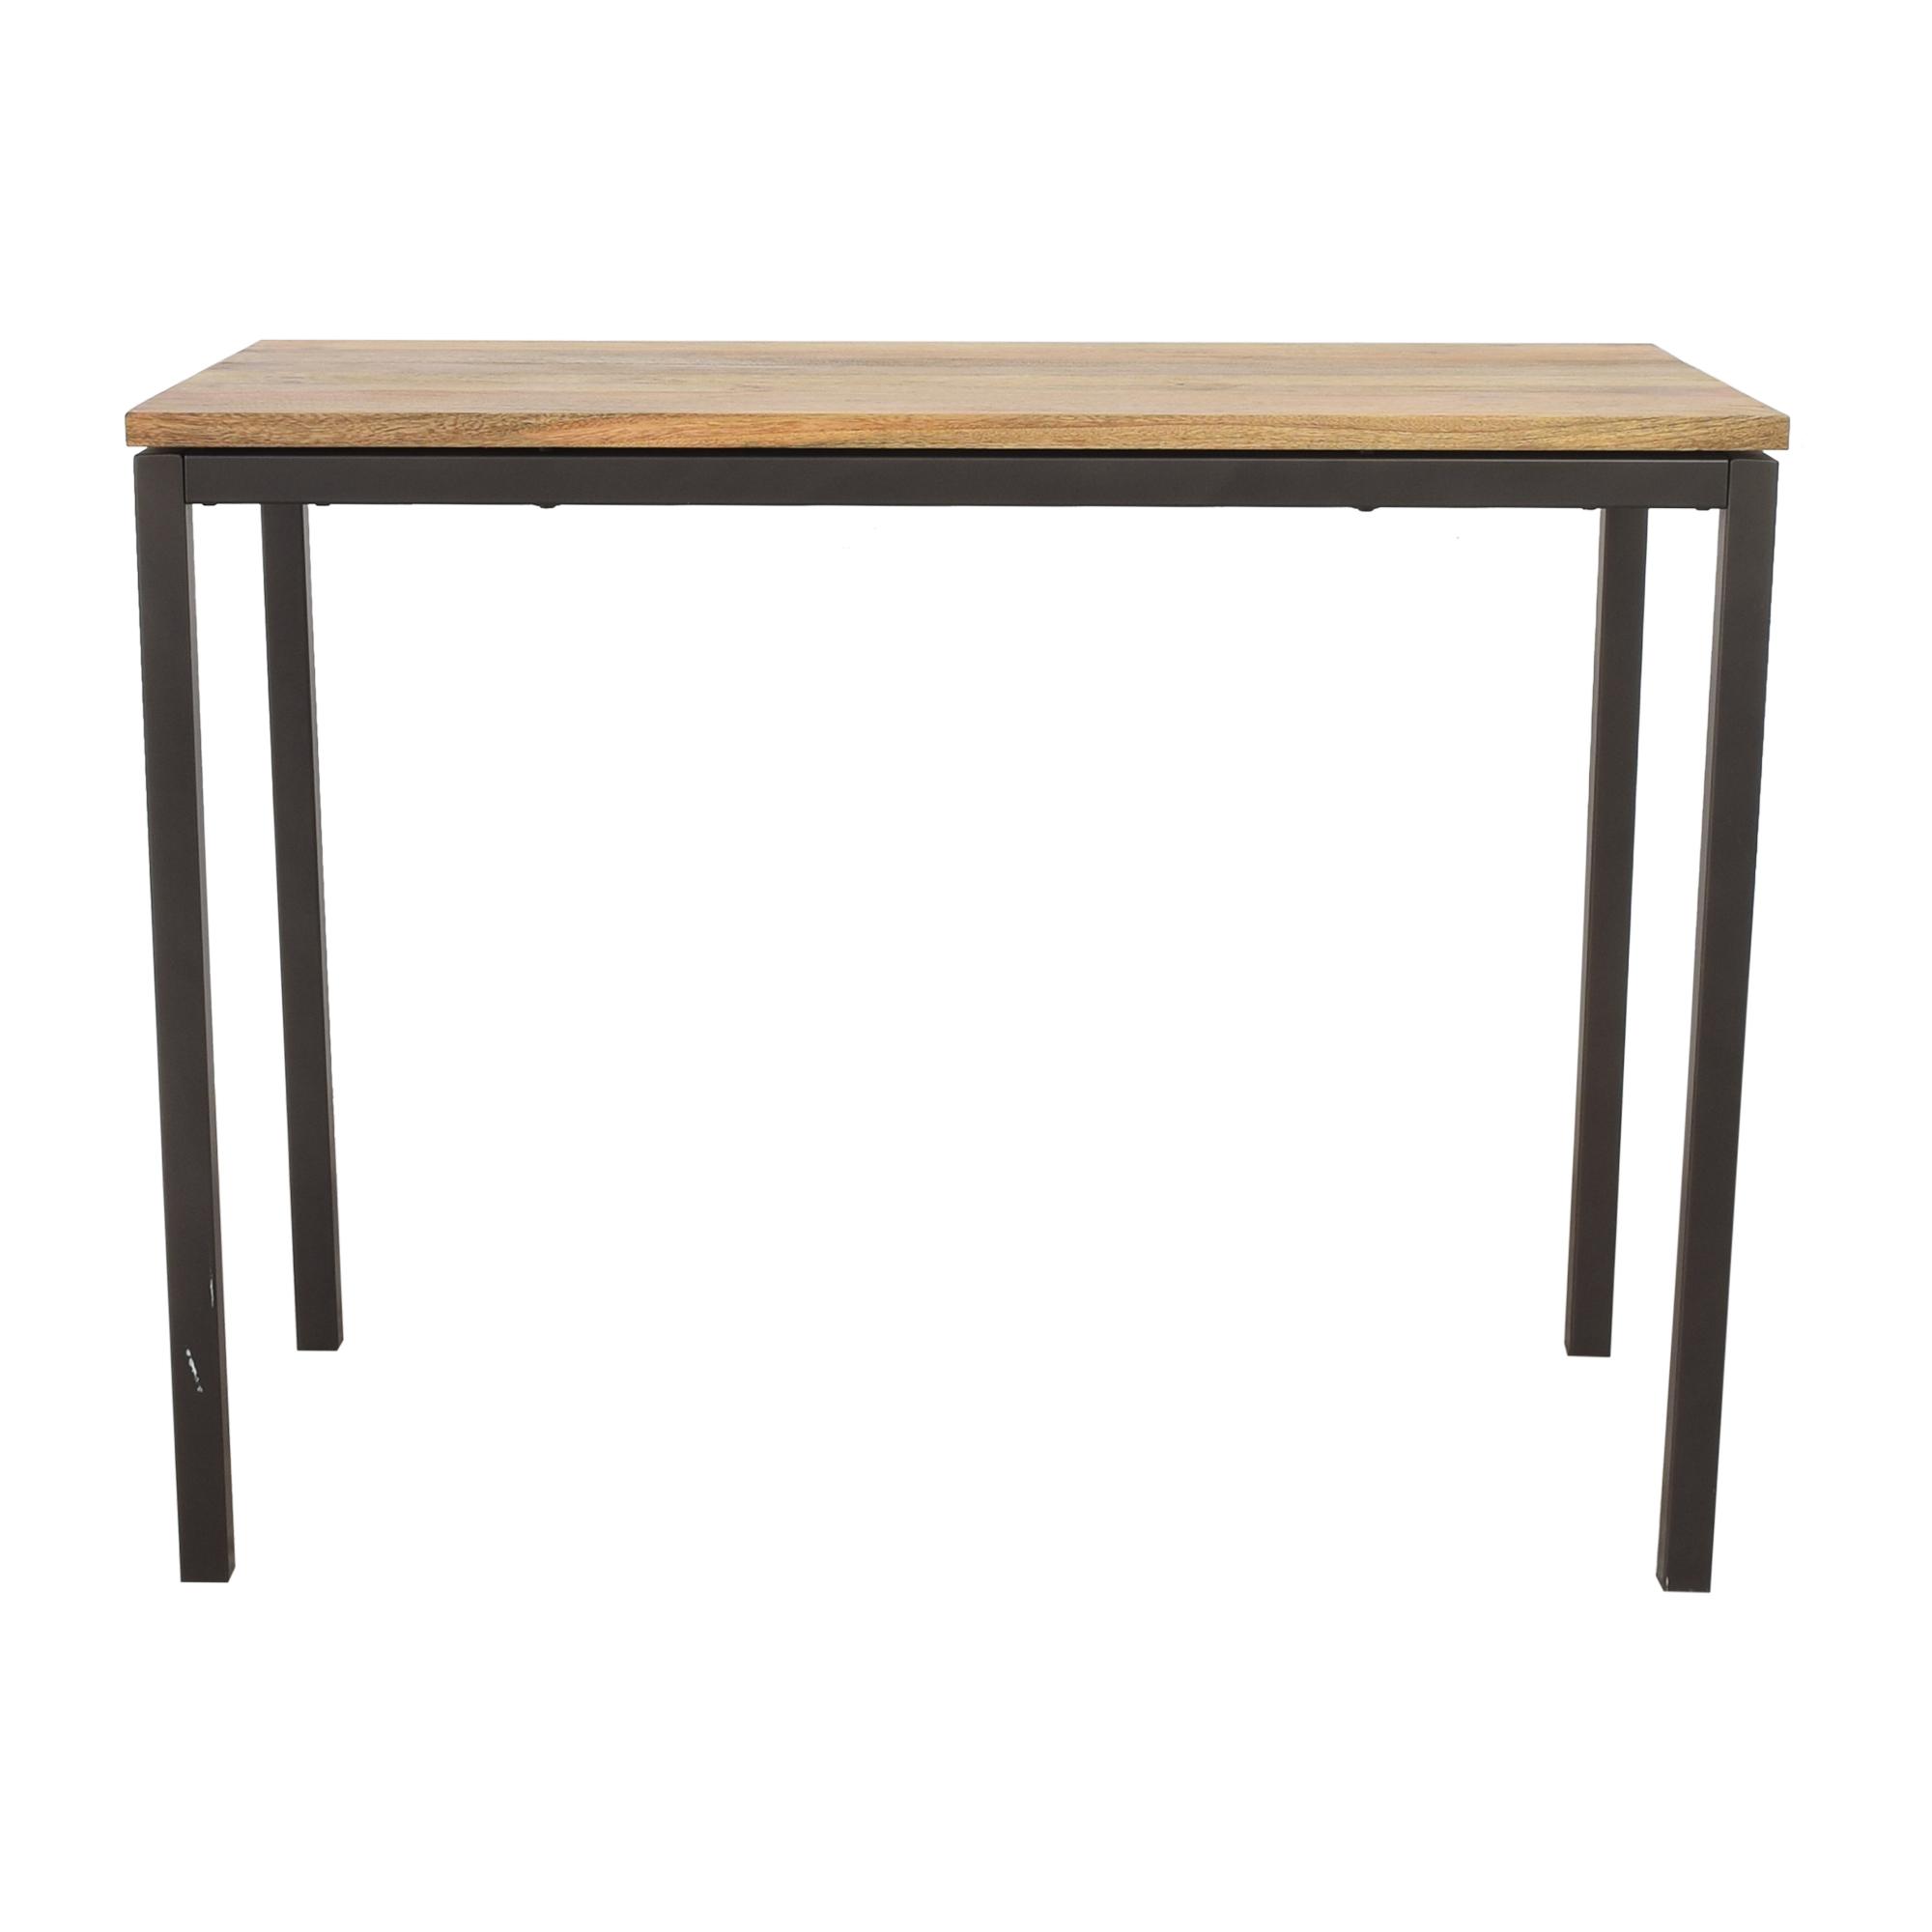 buy West Elm Box Frame Counter Table West Elm Dinner Tables